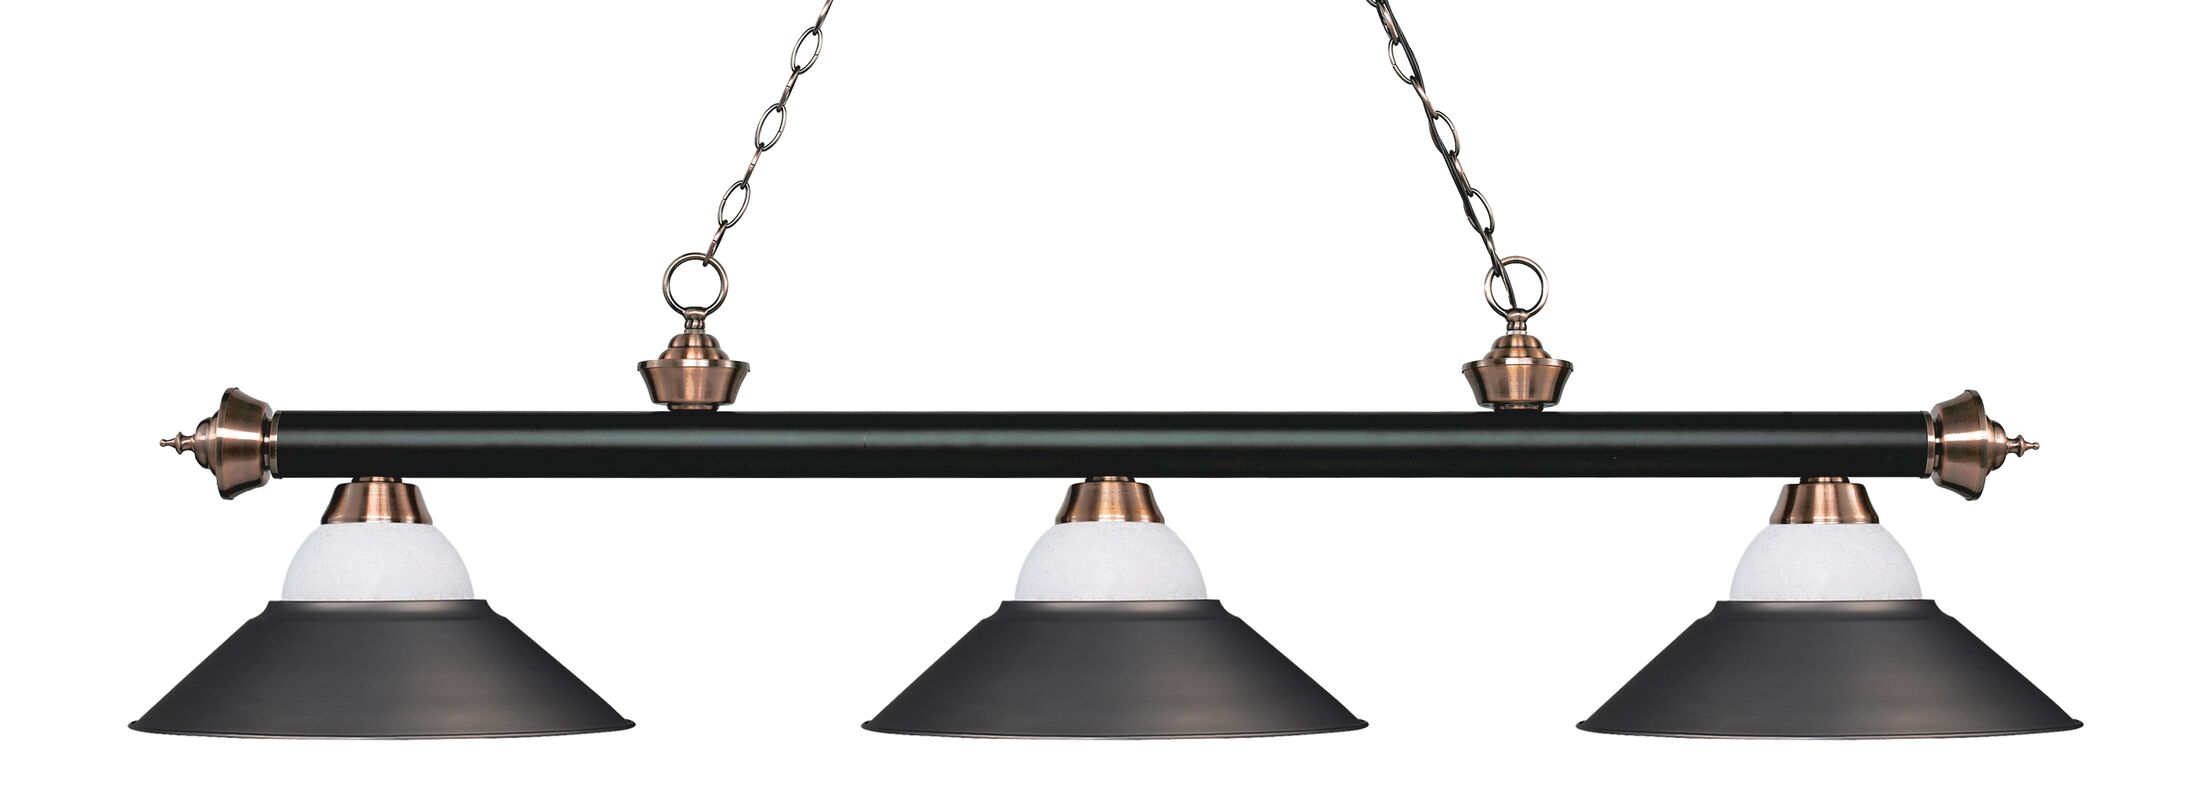 Zephyr Contemporary 3-Light Pool Table Light Base Finish: Matte Black/Antique Copper